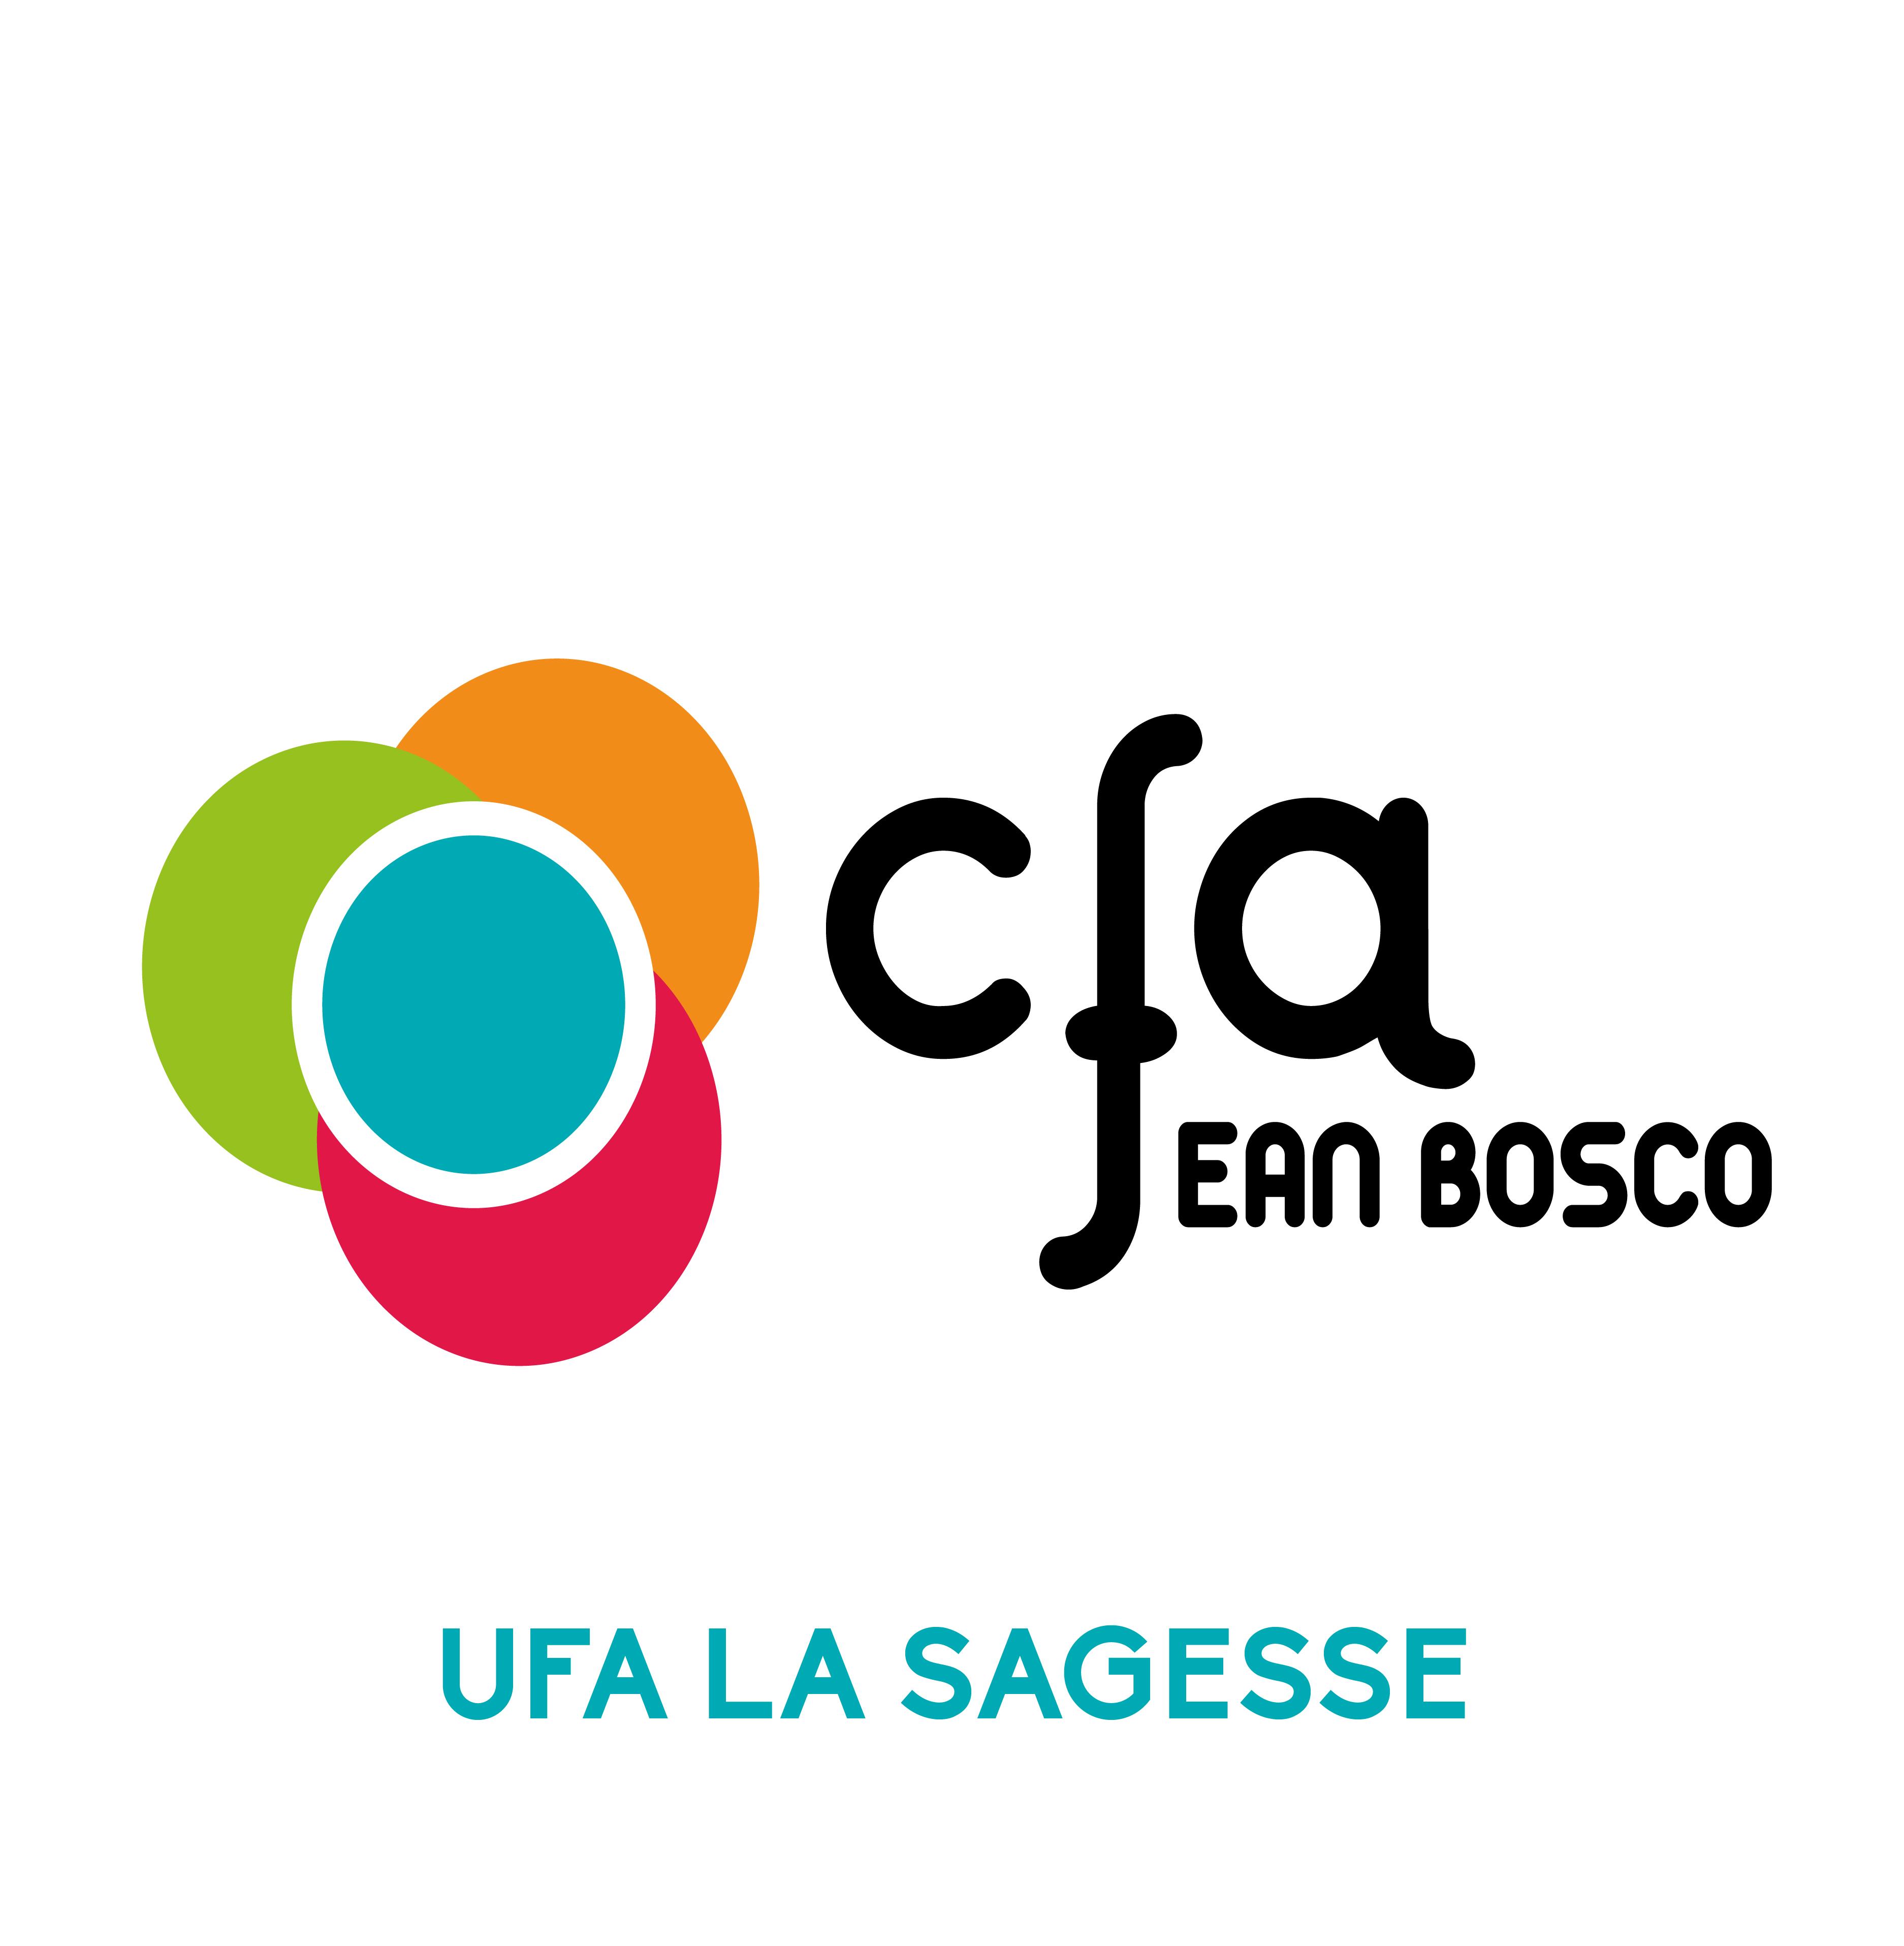 LOGO CFA-LA-SAGESSE